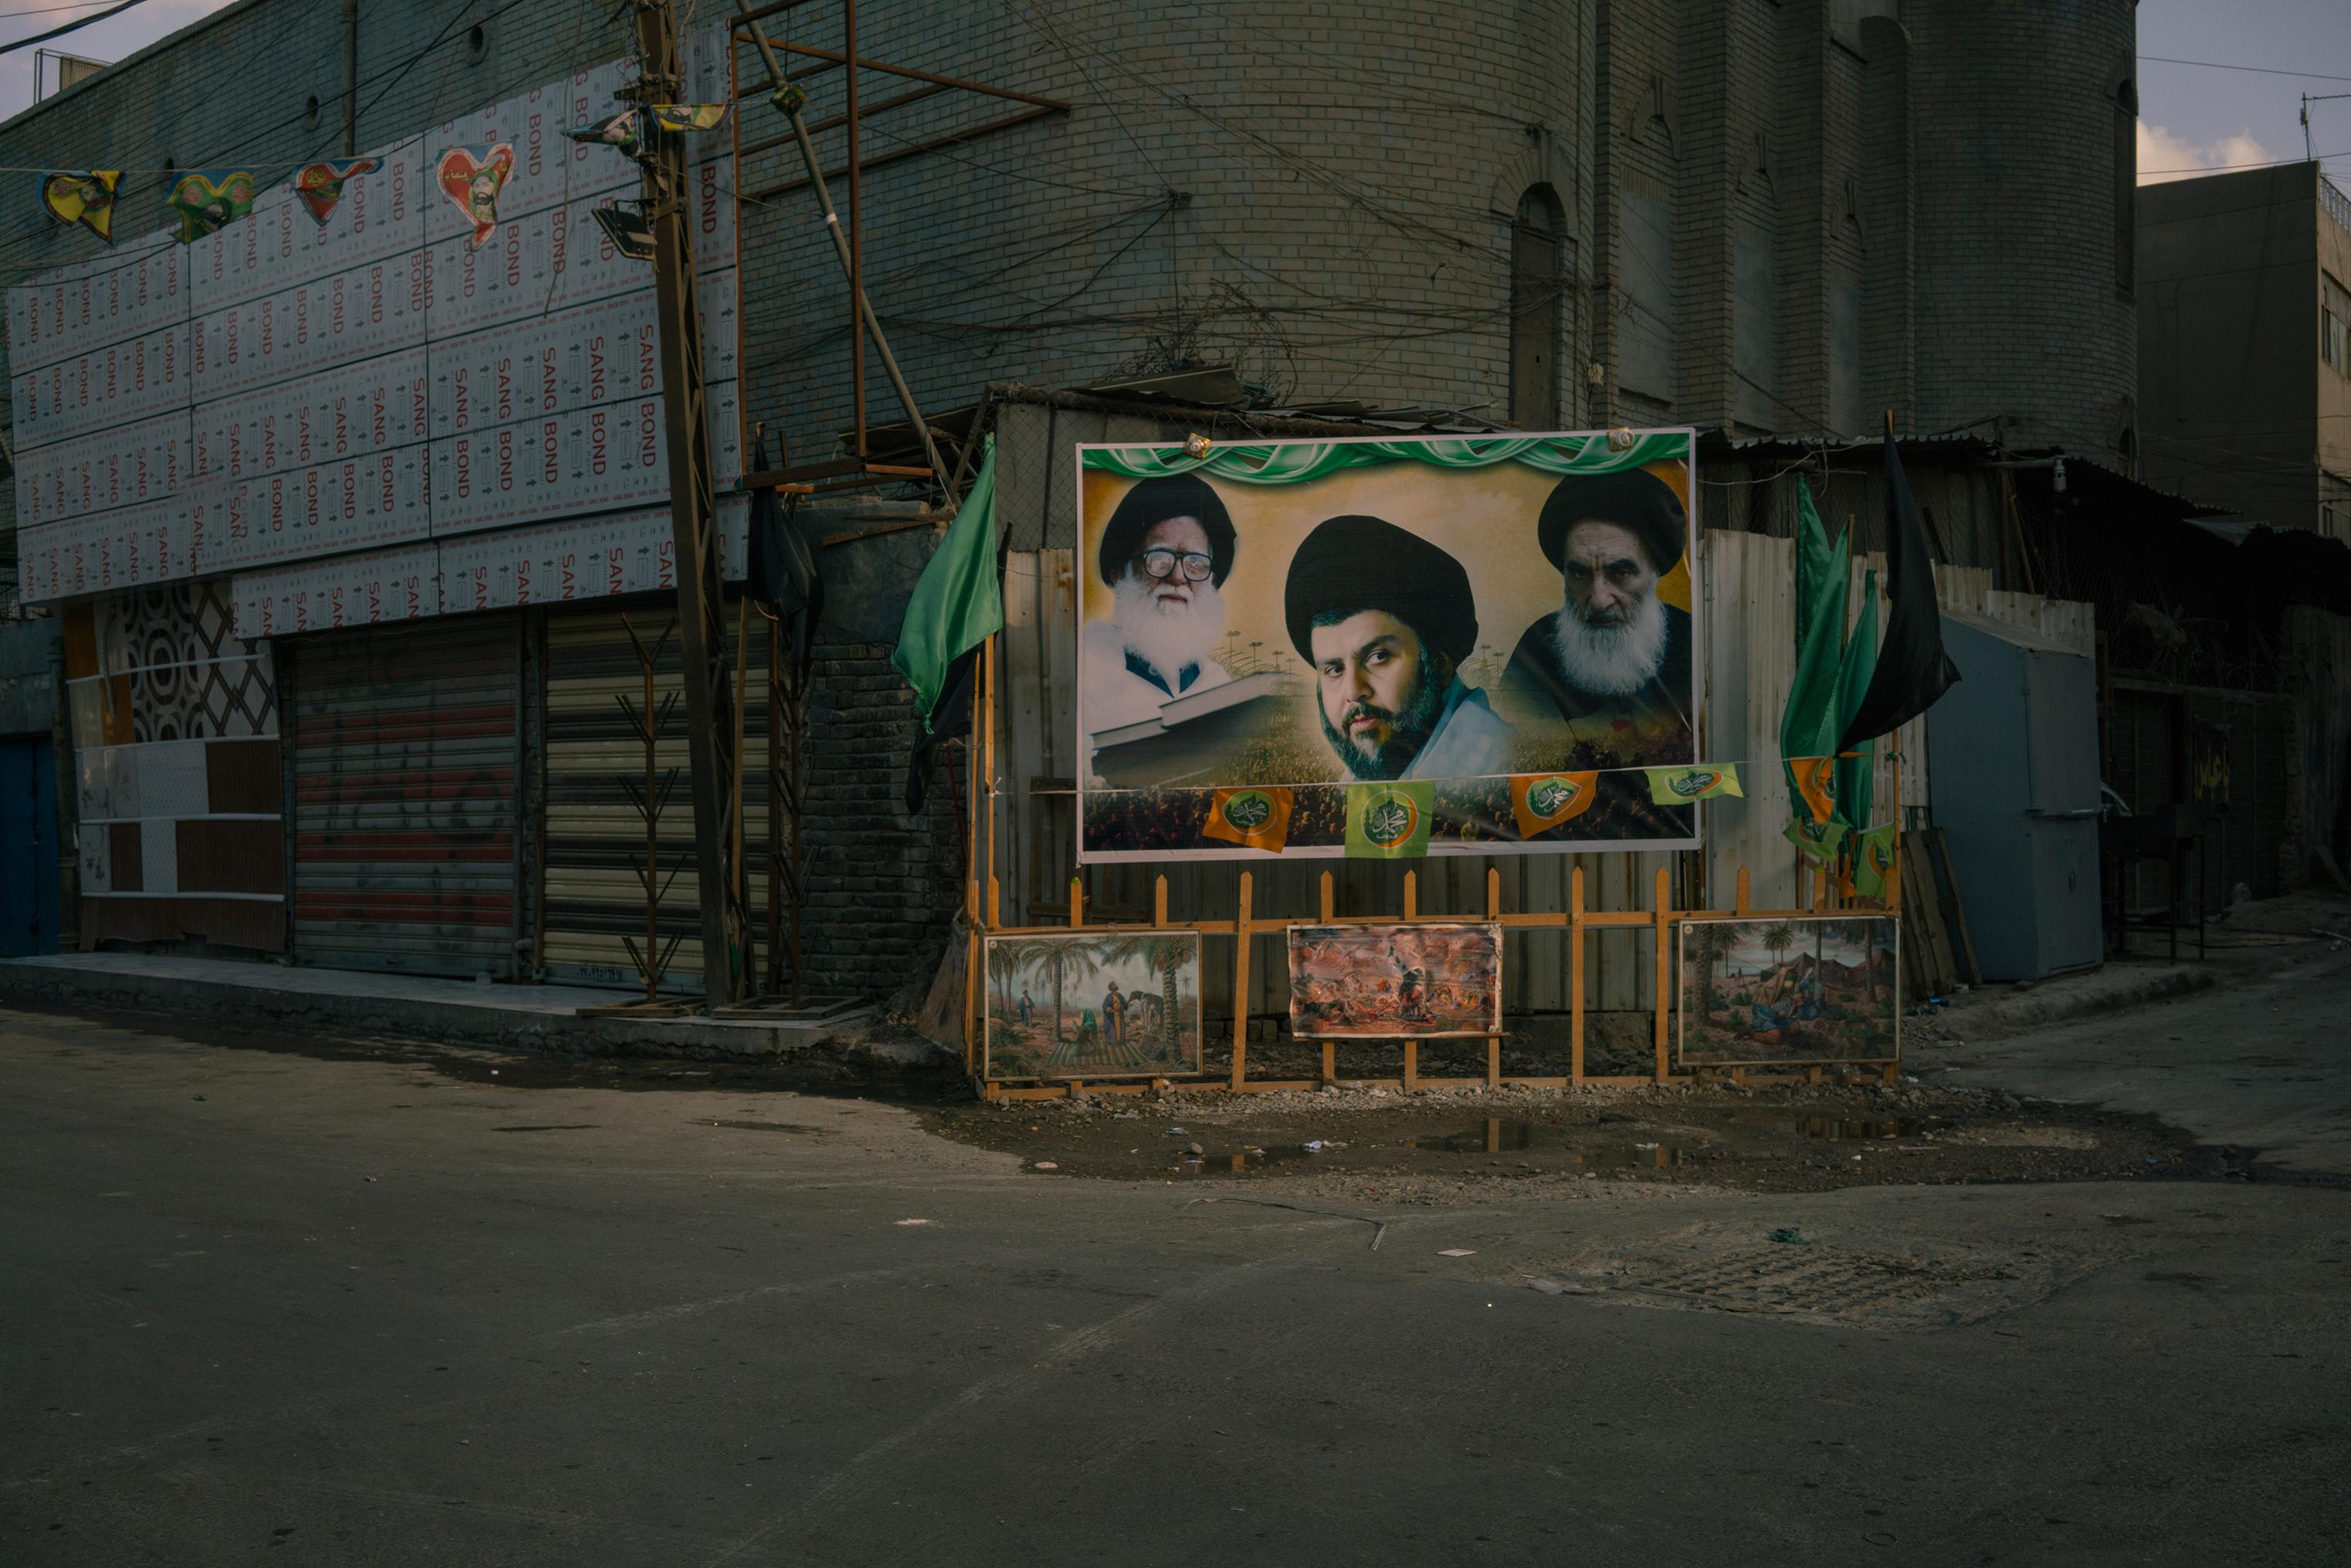 A billboard in Baghdad on Jan. 28 shows portraits of Shi'ite spiritual leaders, from left, Mohammad Sadeq al-Sadr, Muqtada al-Sadr and Ali al-Sistani.